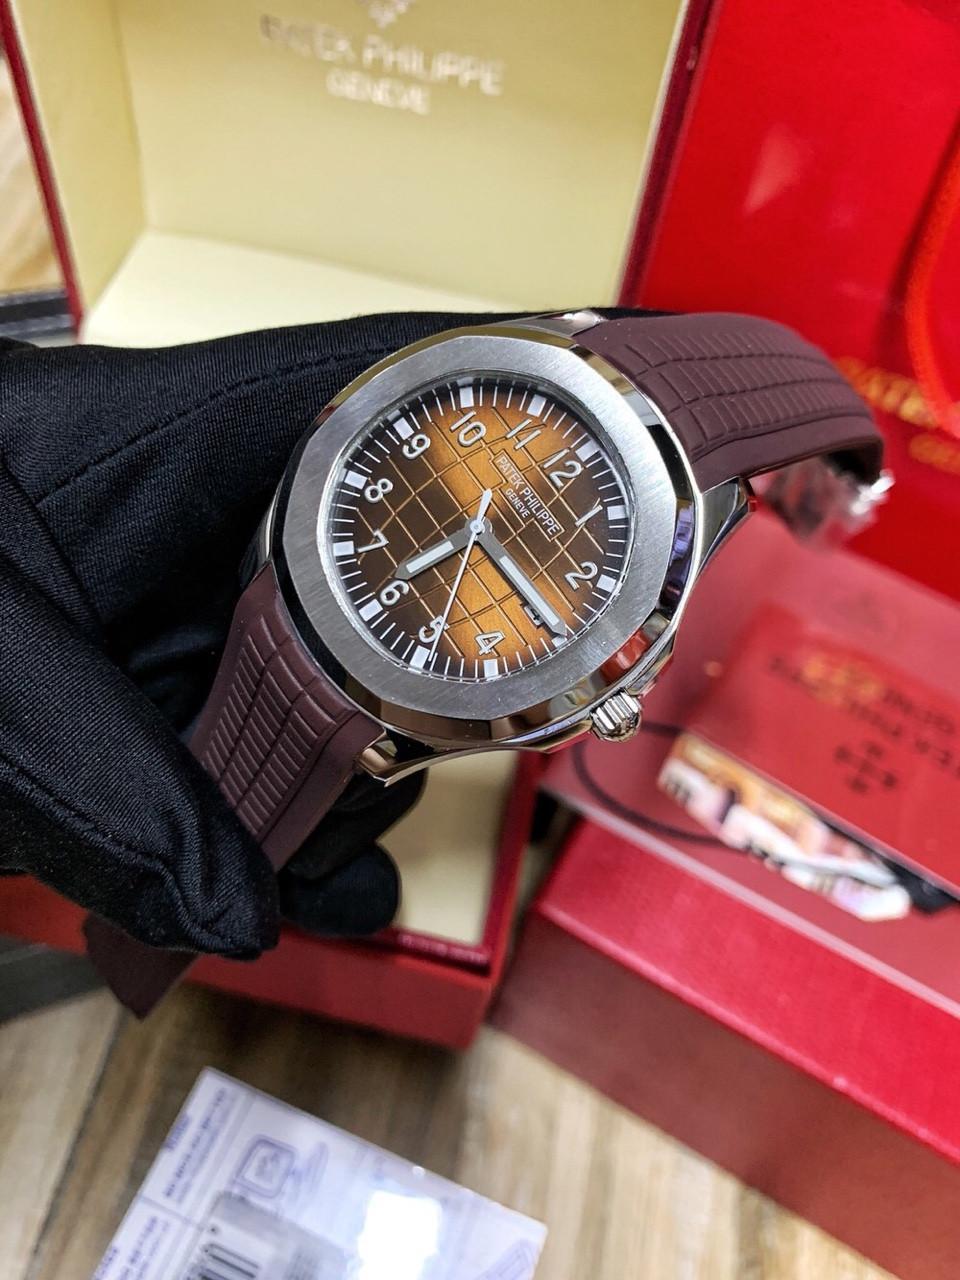 Đồng Hồ Nam Patek Philippe Automatic 5167R-001 bán chạy